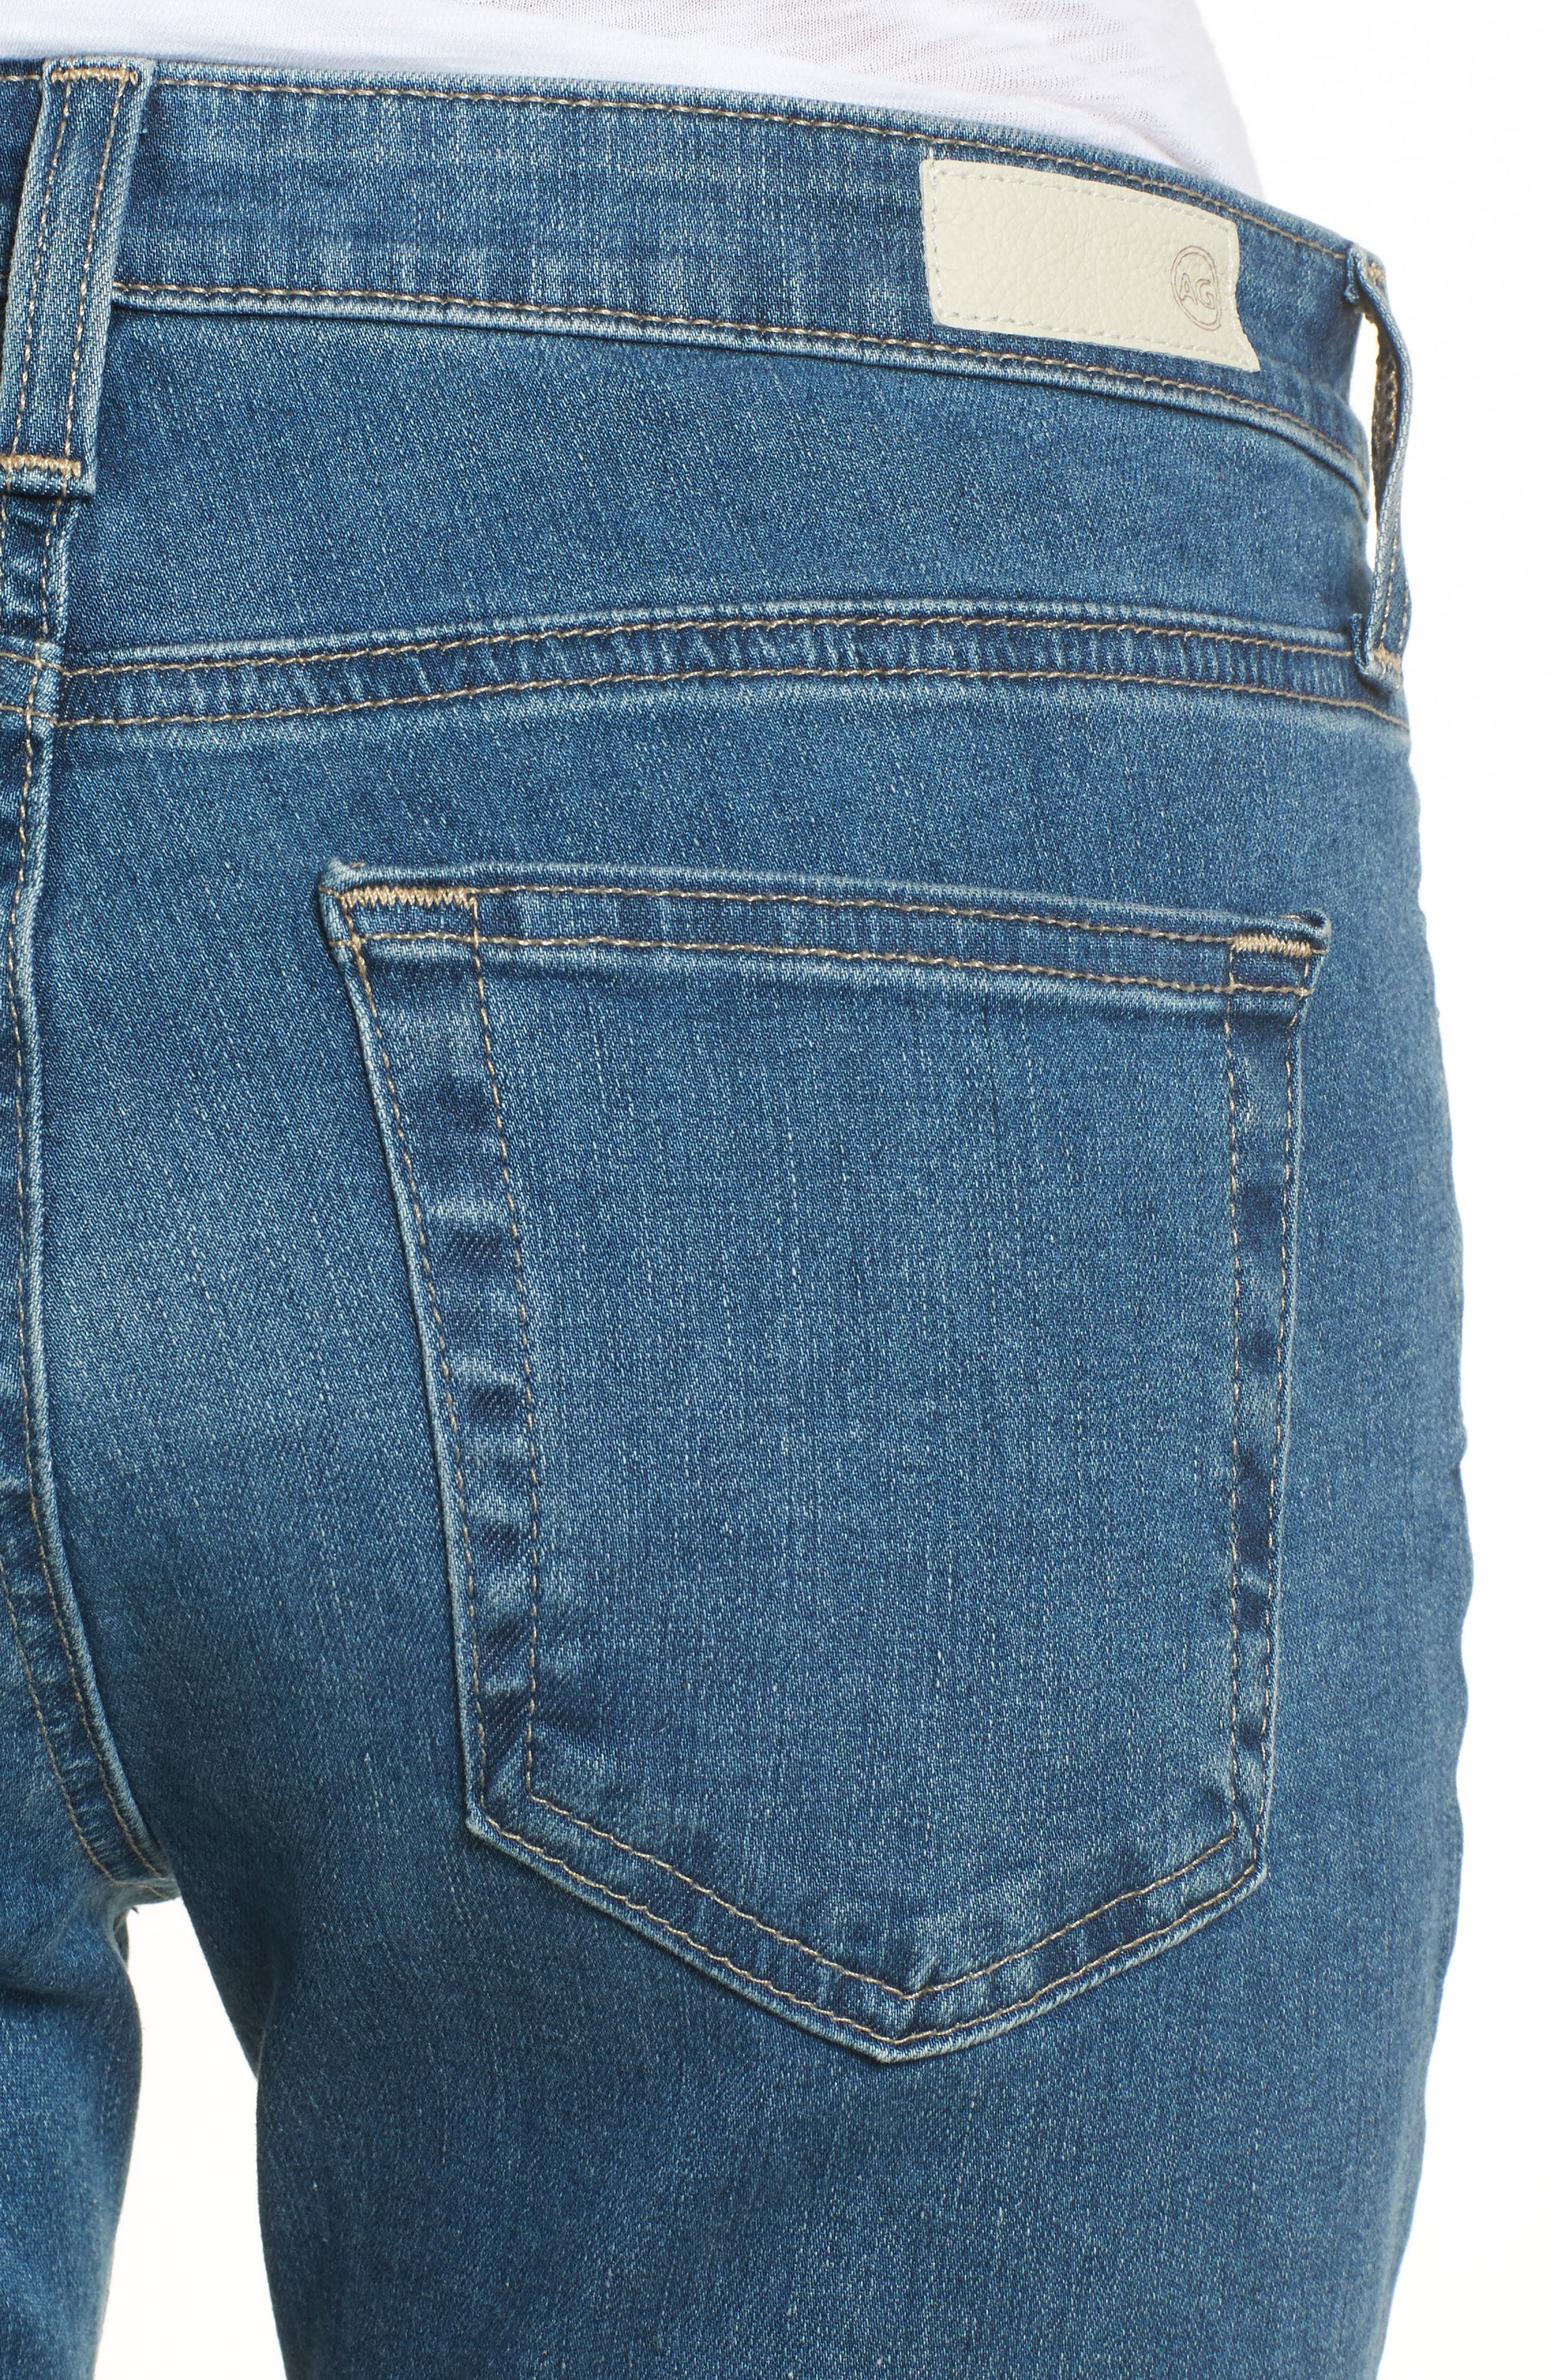 Jodi High Waist Crop Jeans,                             Alternate thumbnail 4, color,                             414